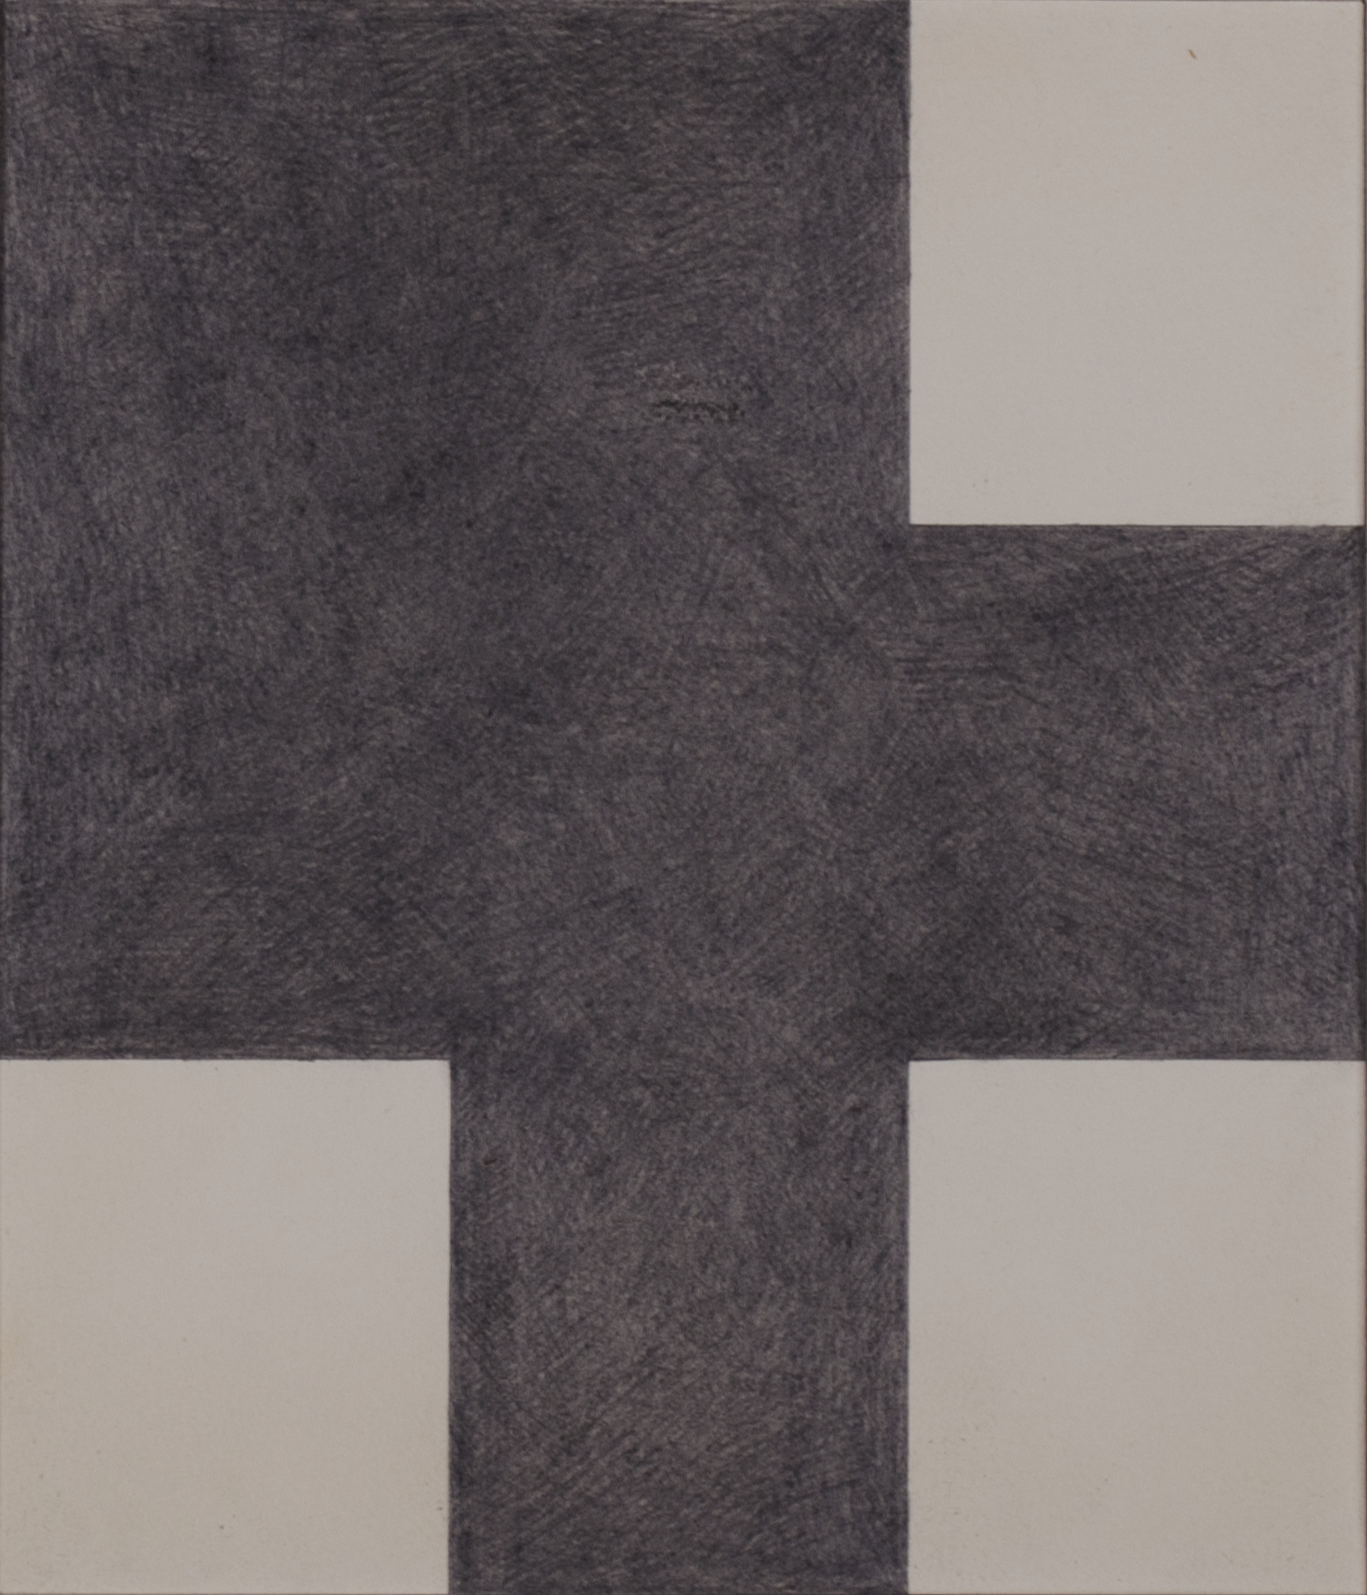 "BLACK SHAPE 1981 ©  GRAPHITE ON PAPER 9"" x 9"""